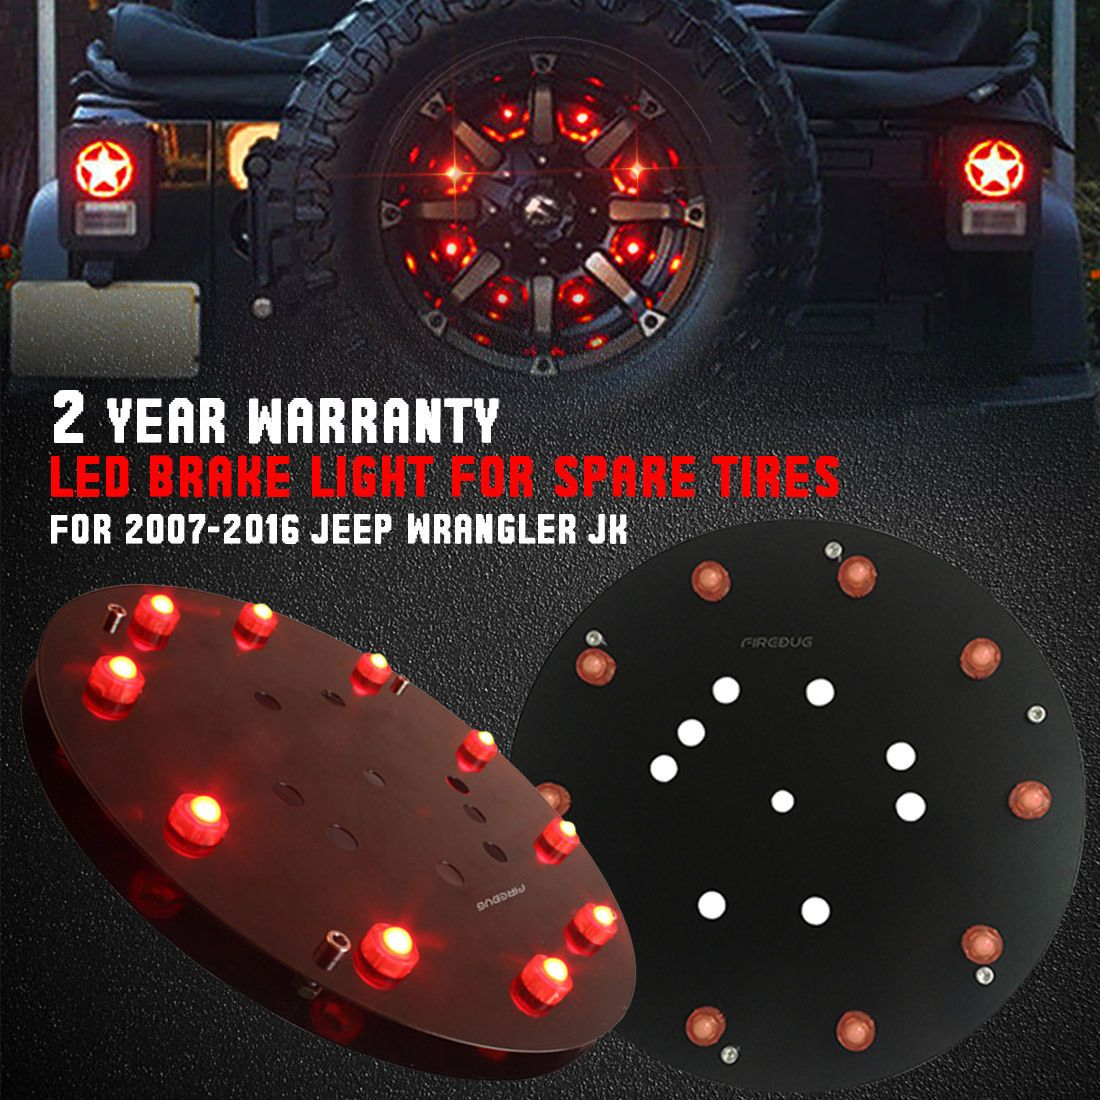 Jeep Wrangler Third Brake Light,Spare Tire LED Tail Light